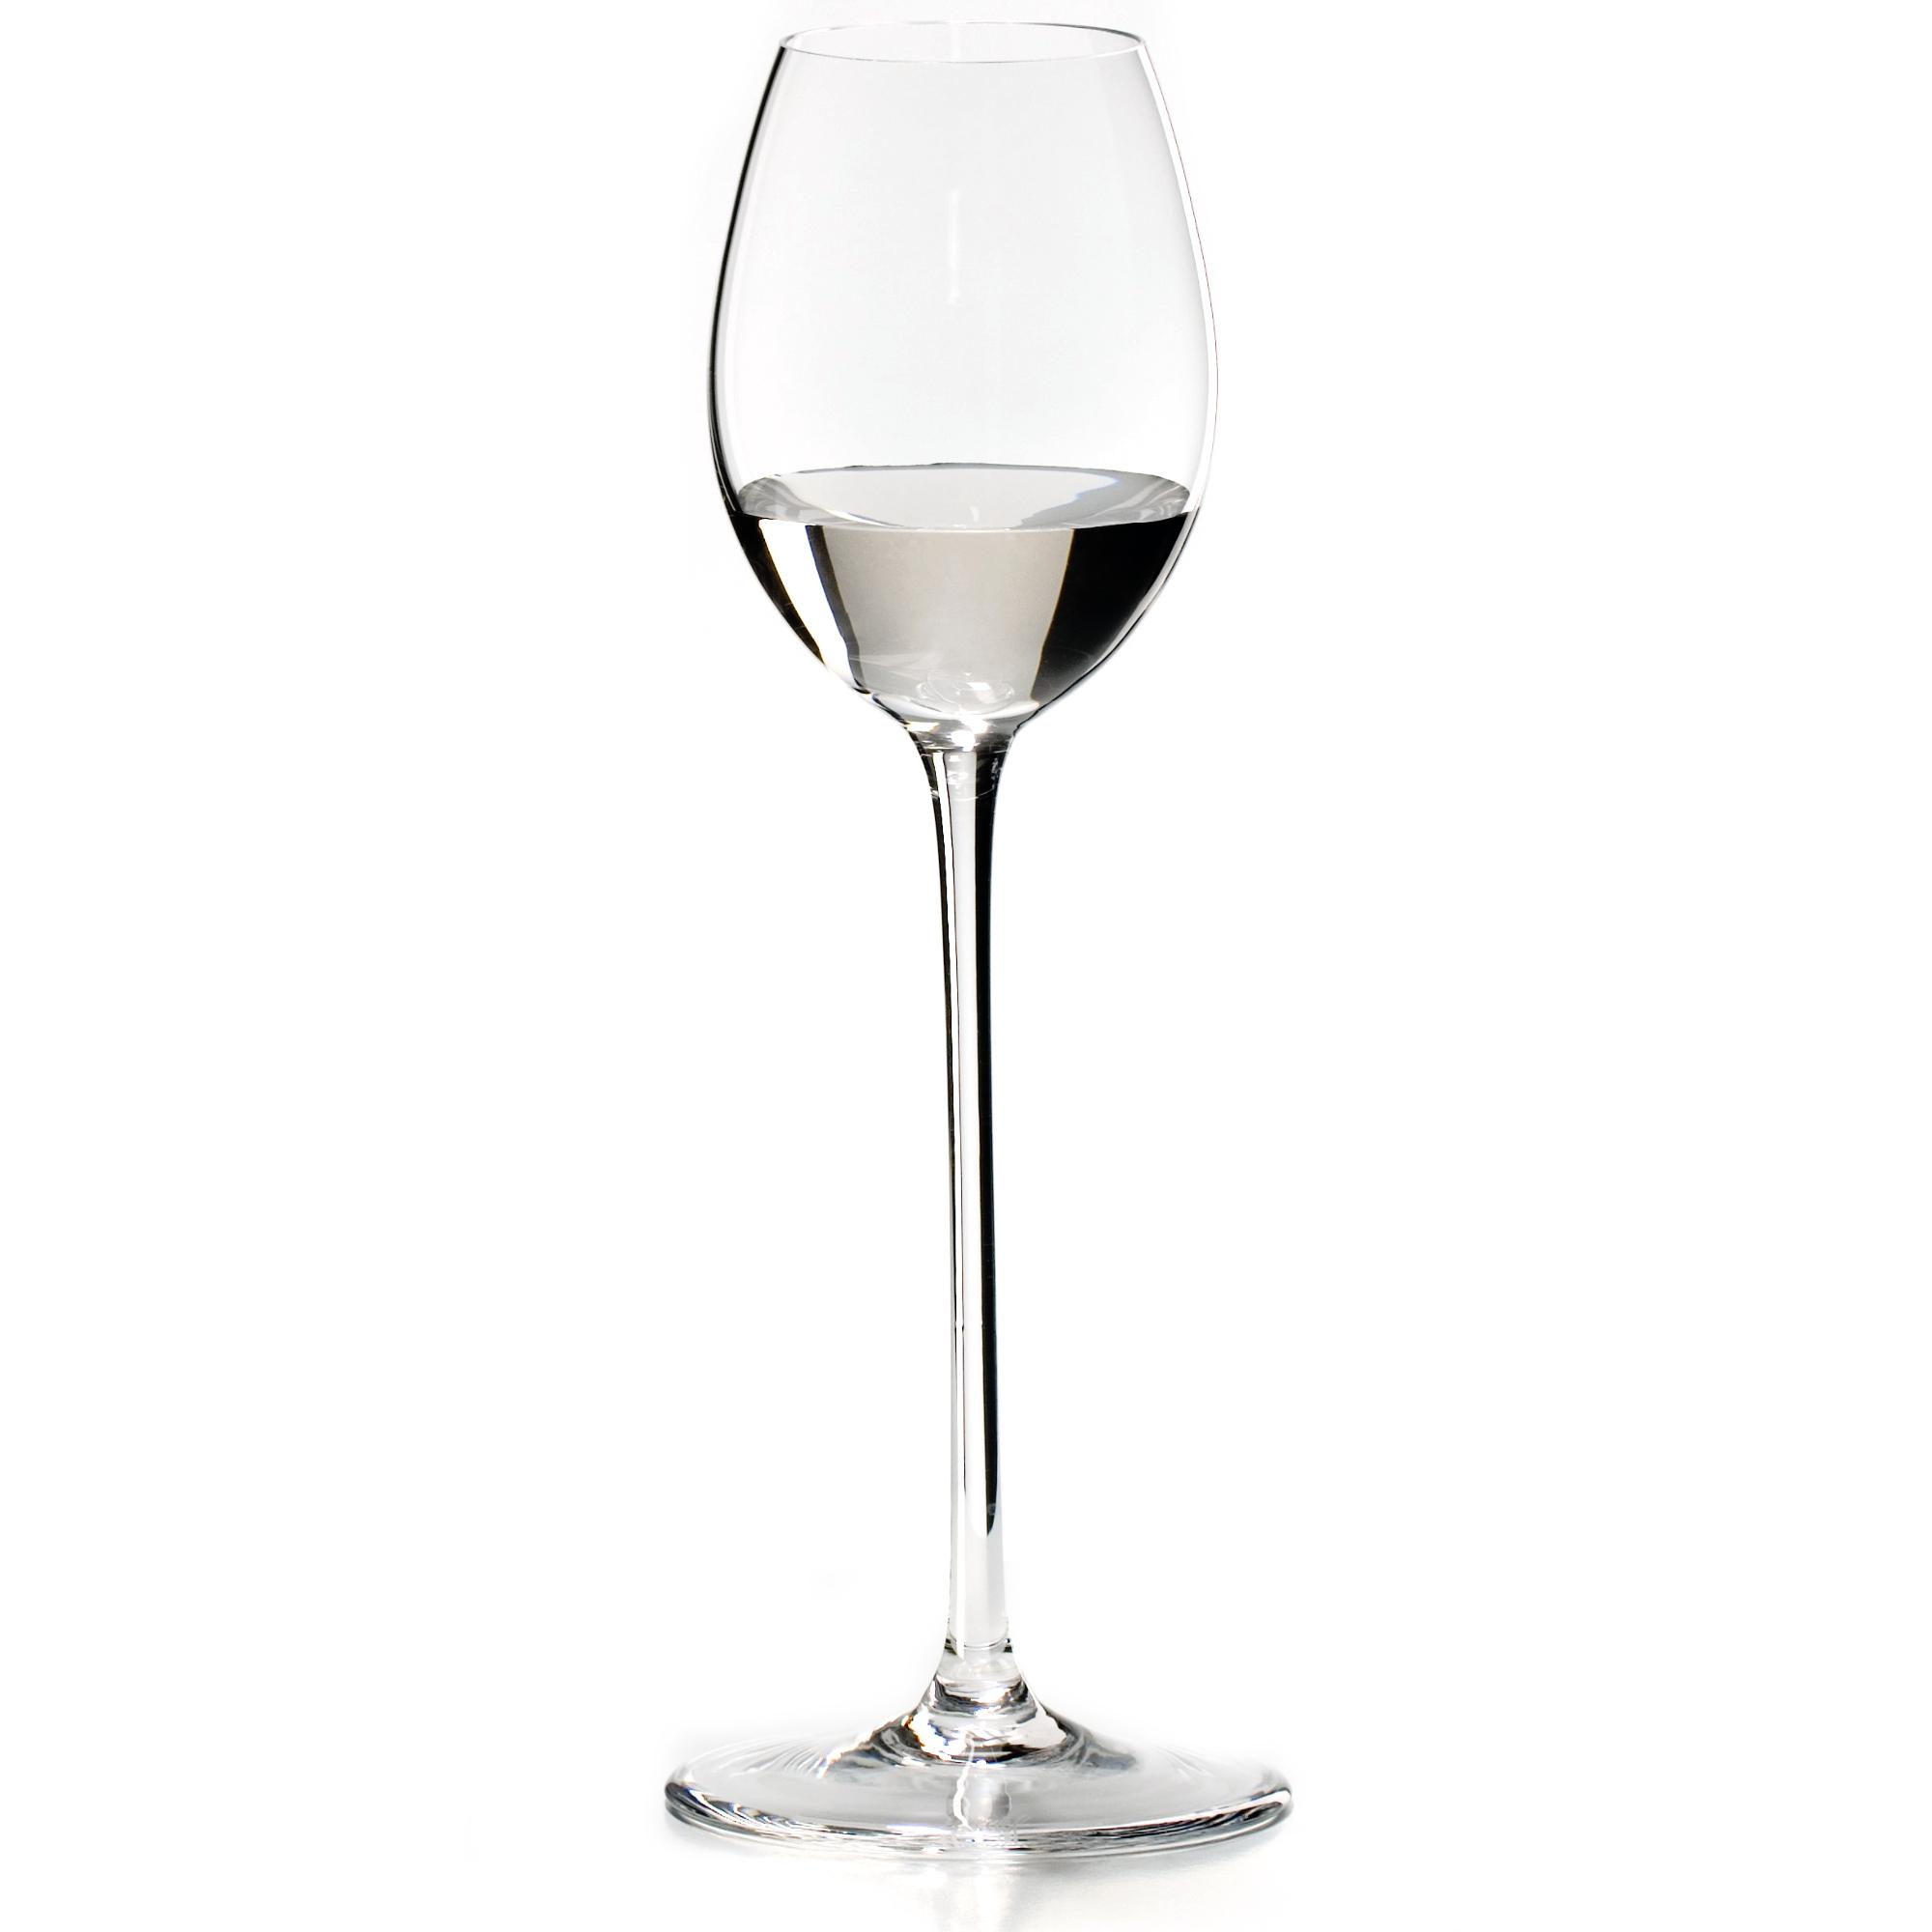 Riedel Sommeliers Crystal Orchard Fruit Destillate Glass